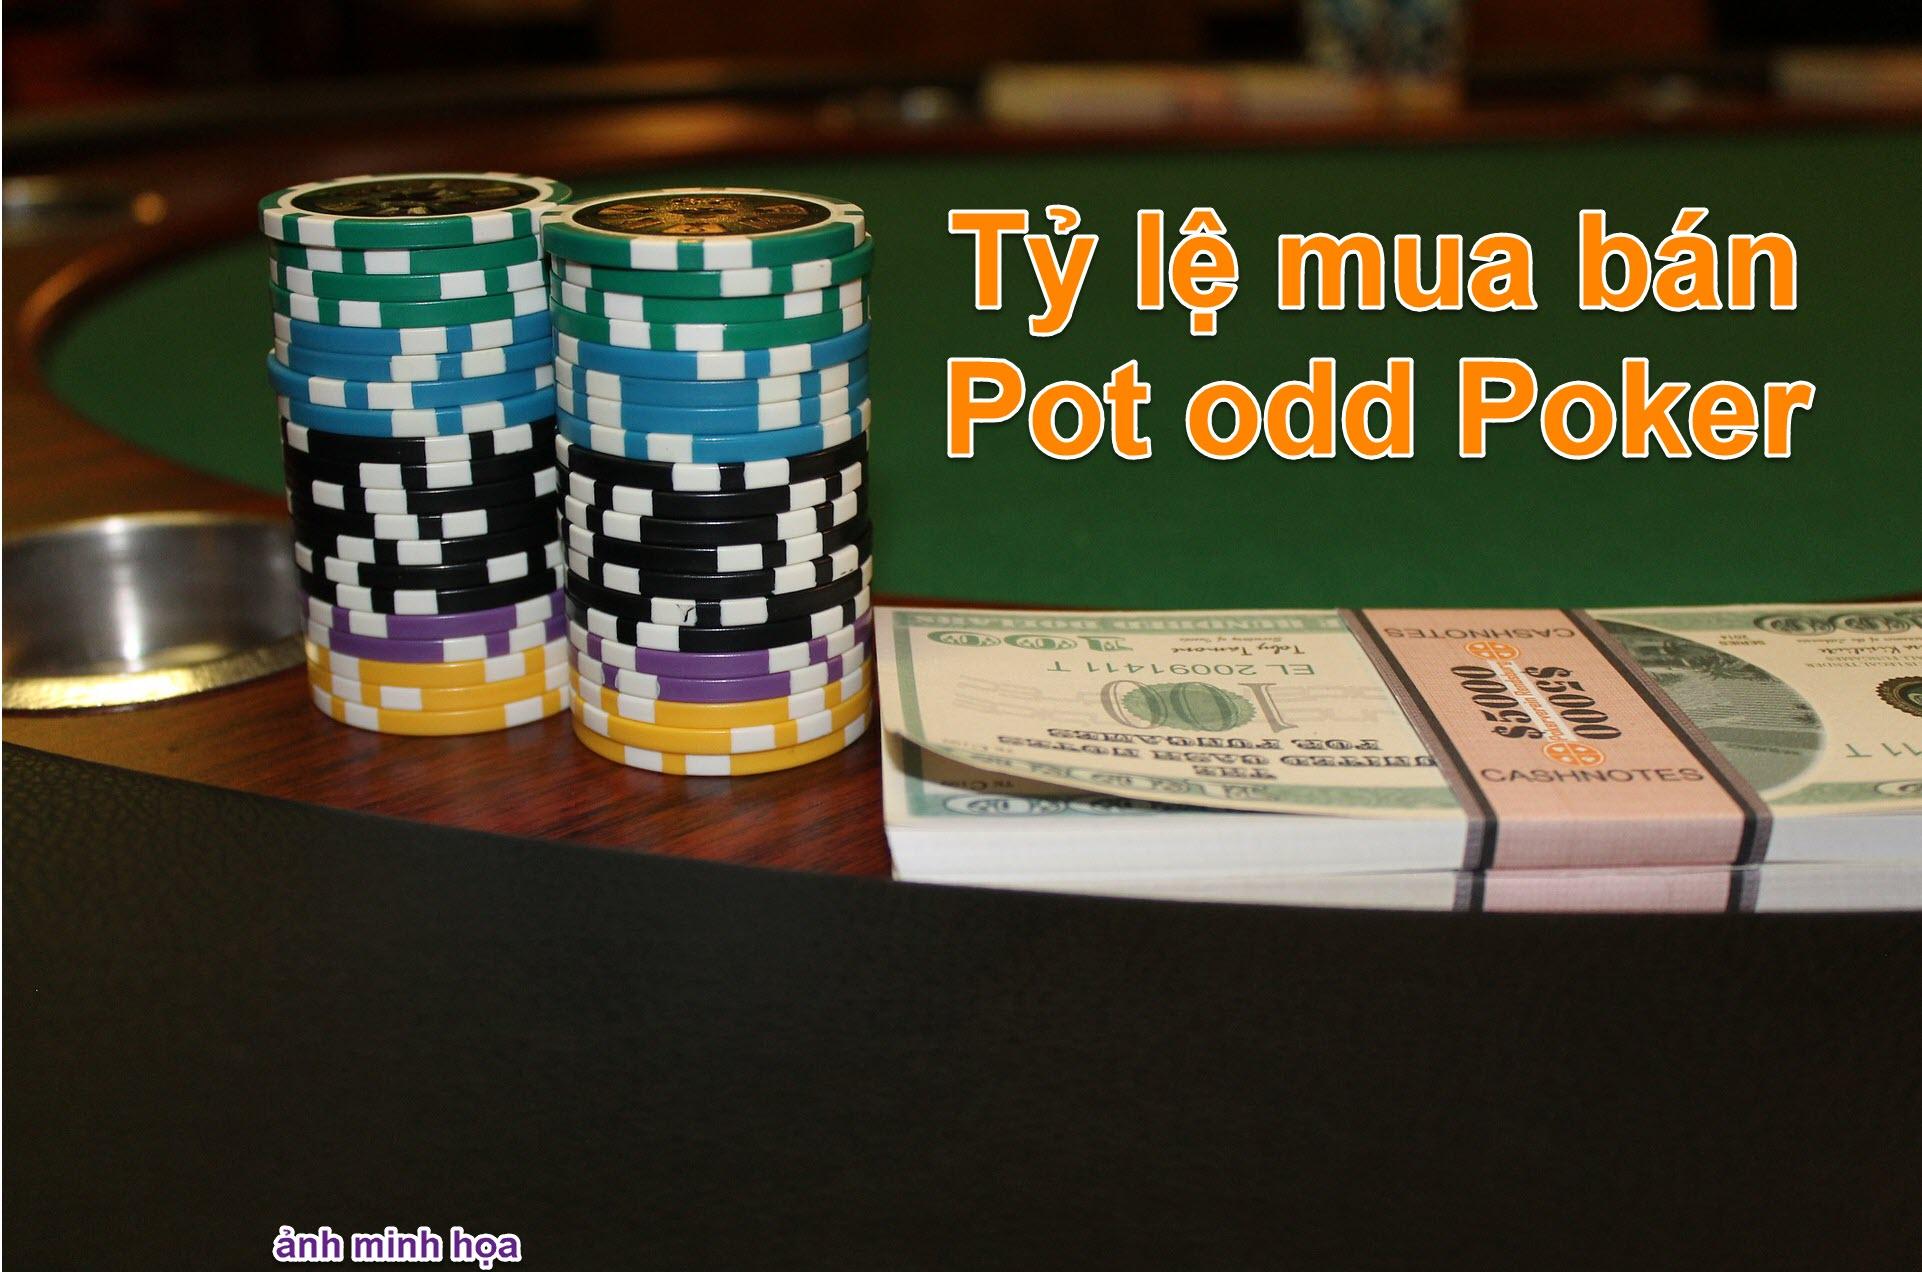 ty le mua ban Pot odd trong Poker 01 ver 01.jpg